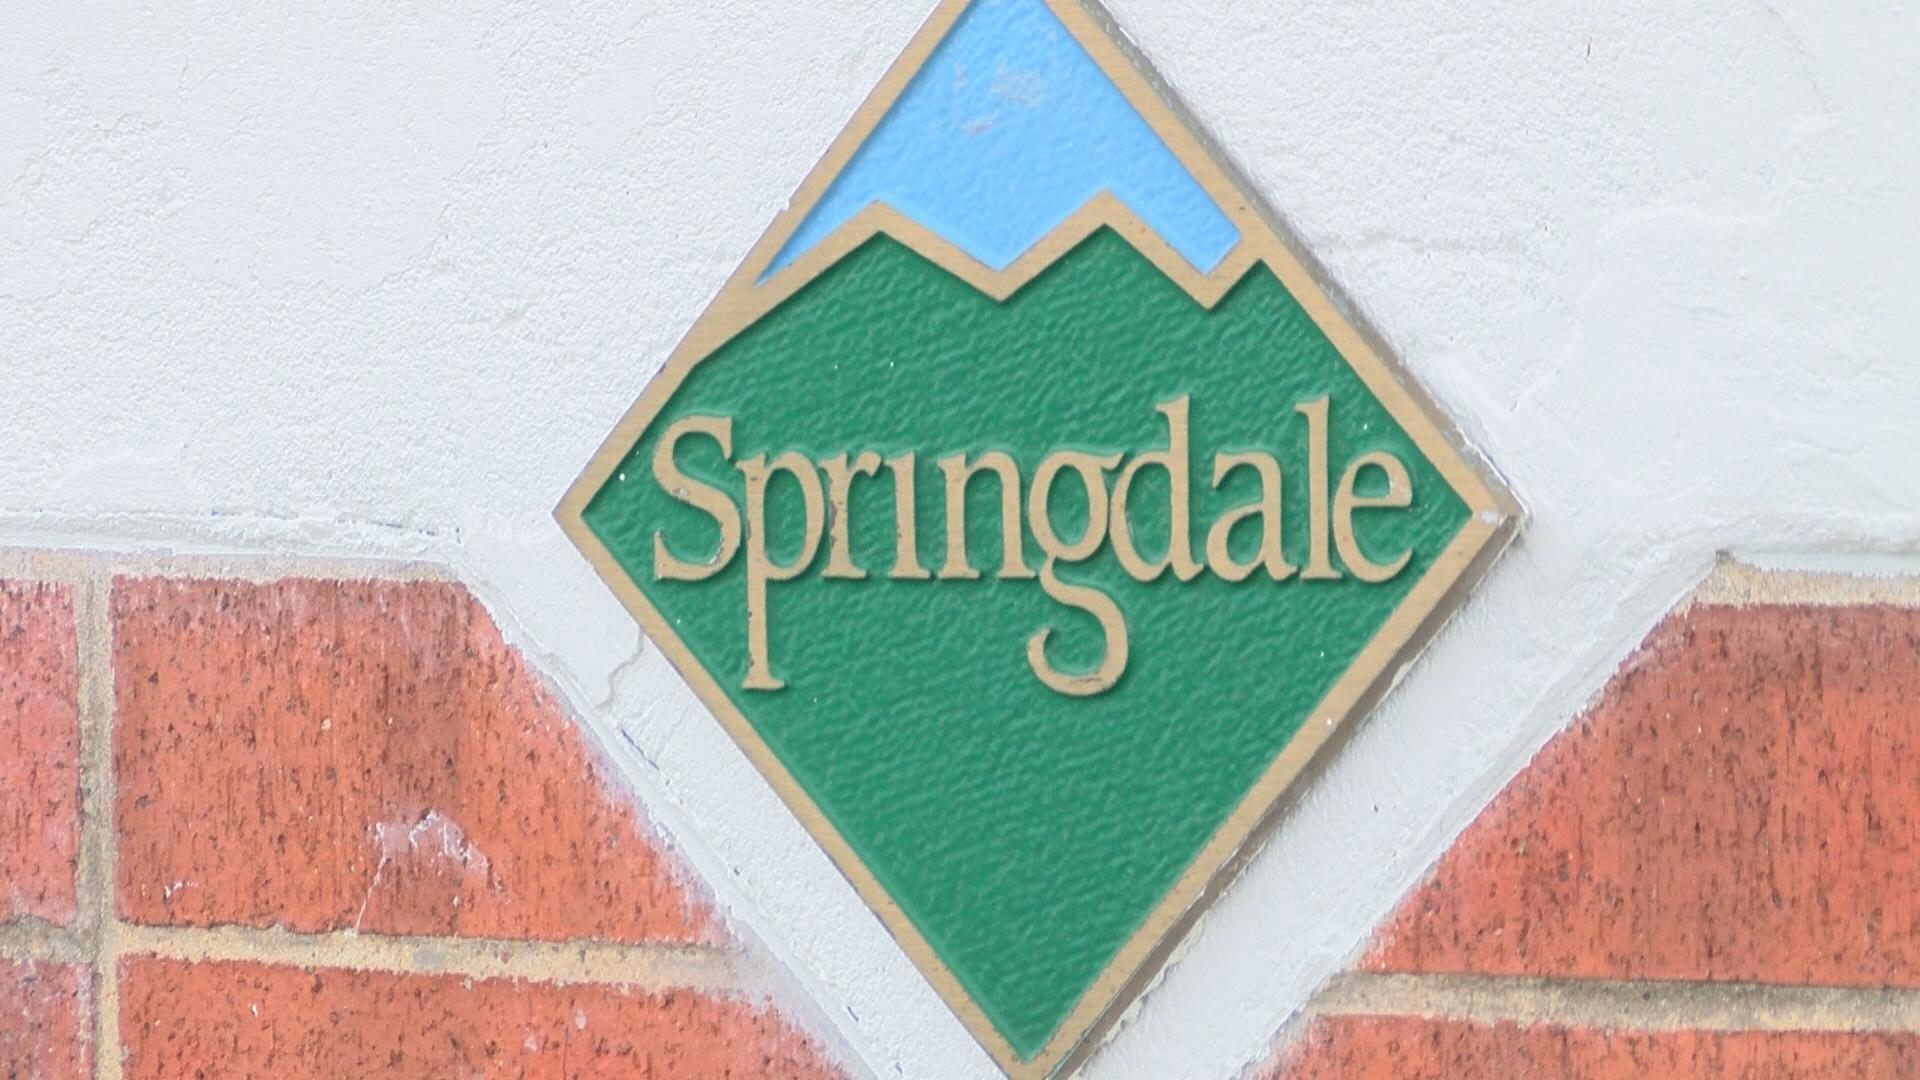 SPRINGDALE CITY COUNCIL_1511924633448.jpg